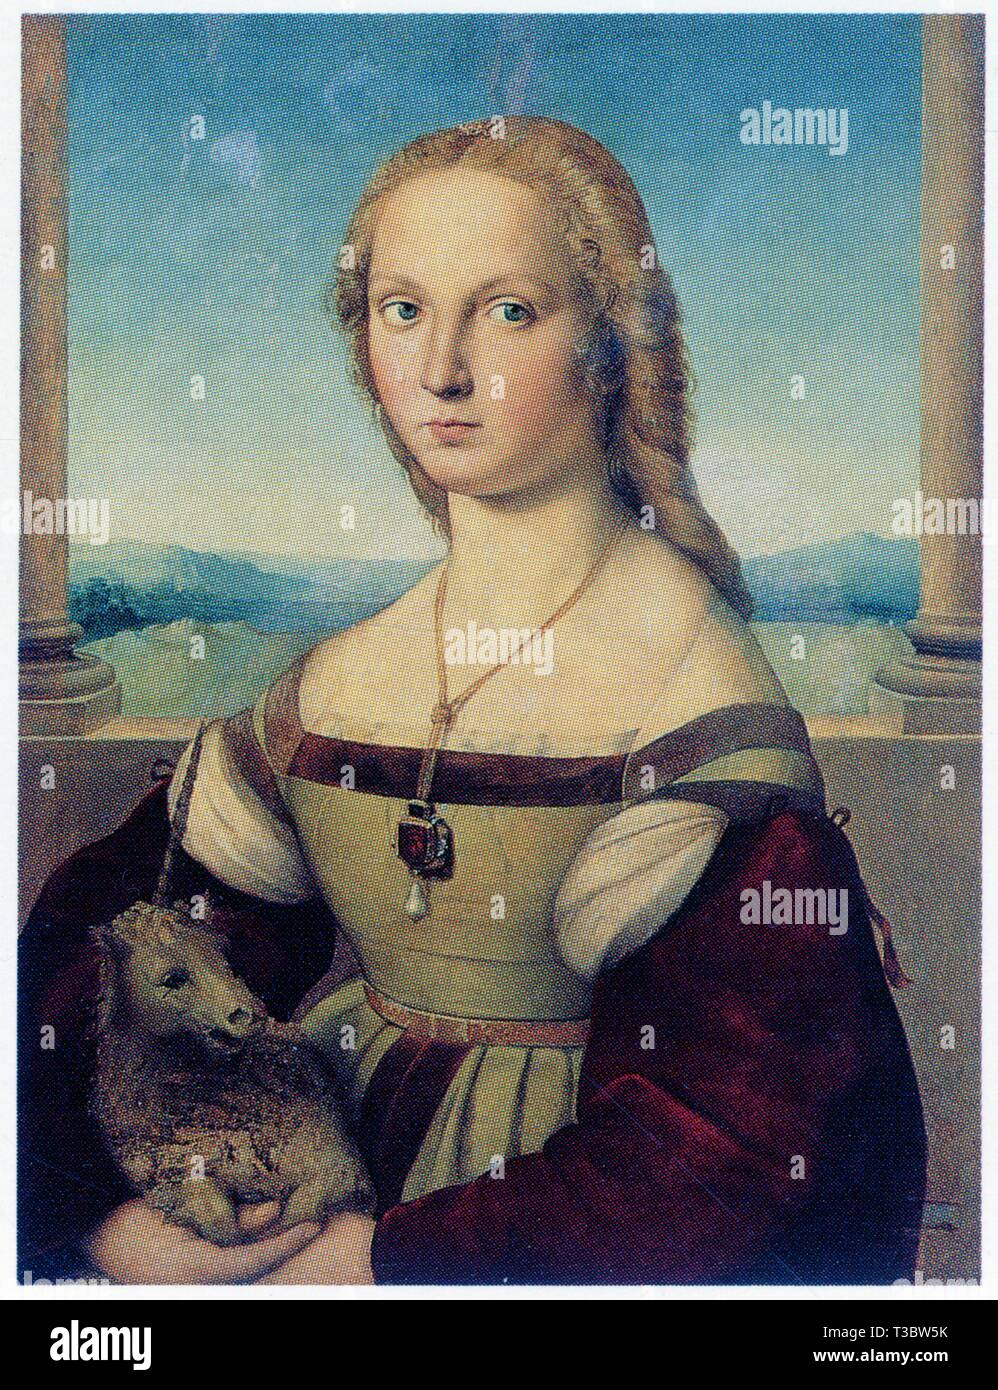 RAPHAEL.LADY WITH THE UNICORN.1504.OIL ON WOOD.65 CM X 51 CM - Stock Image